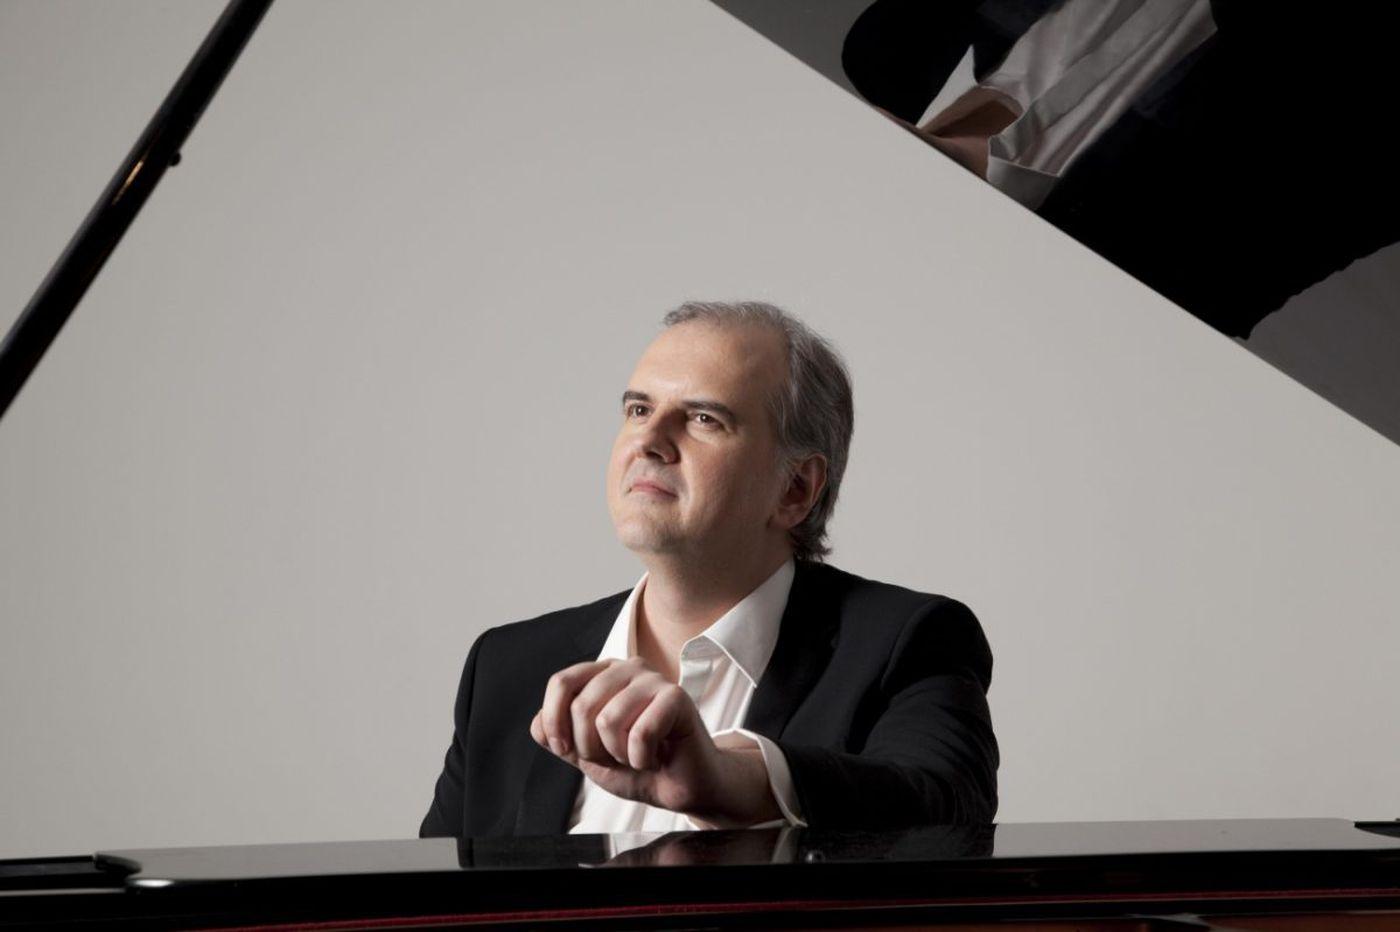 Nicholas Angelich joins Stéphane Denève and Philadelphia Orchestra on musical jaunts